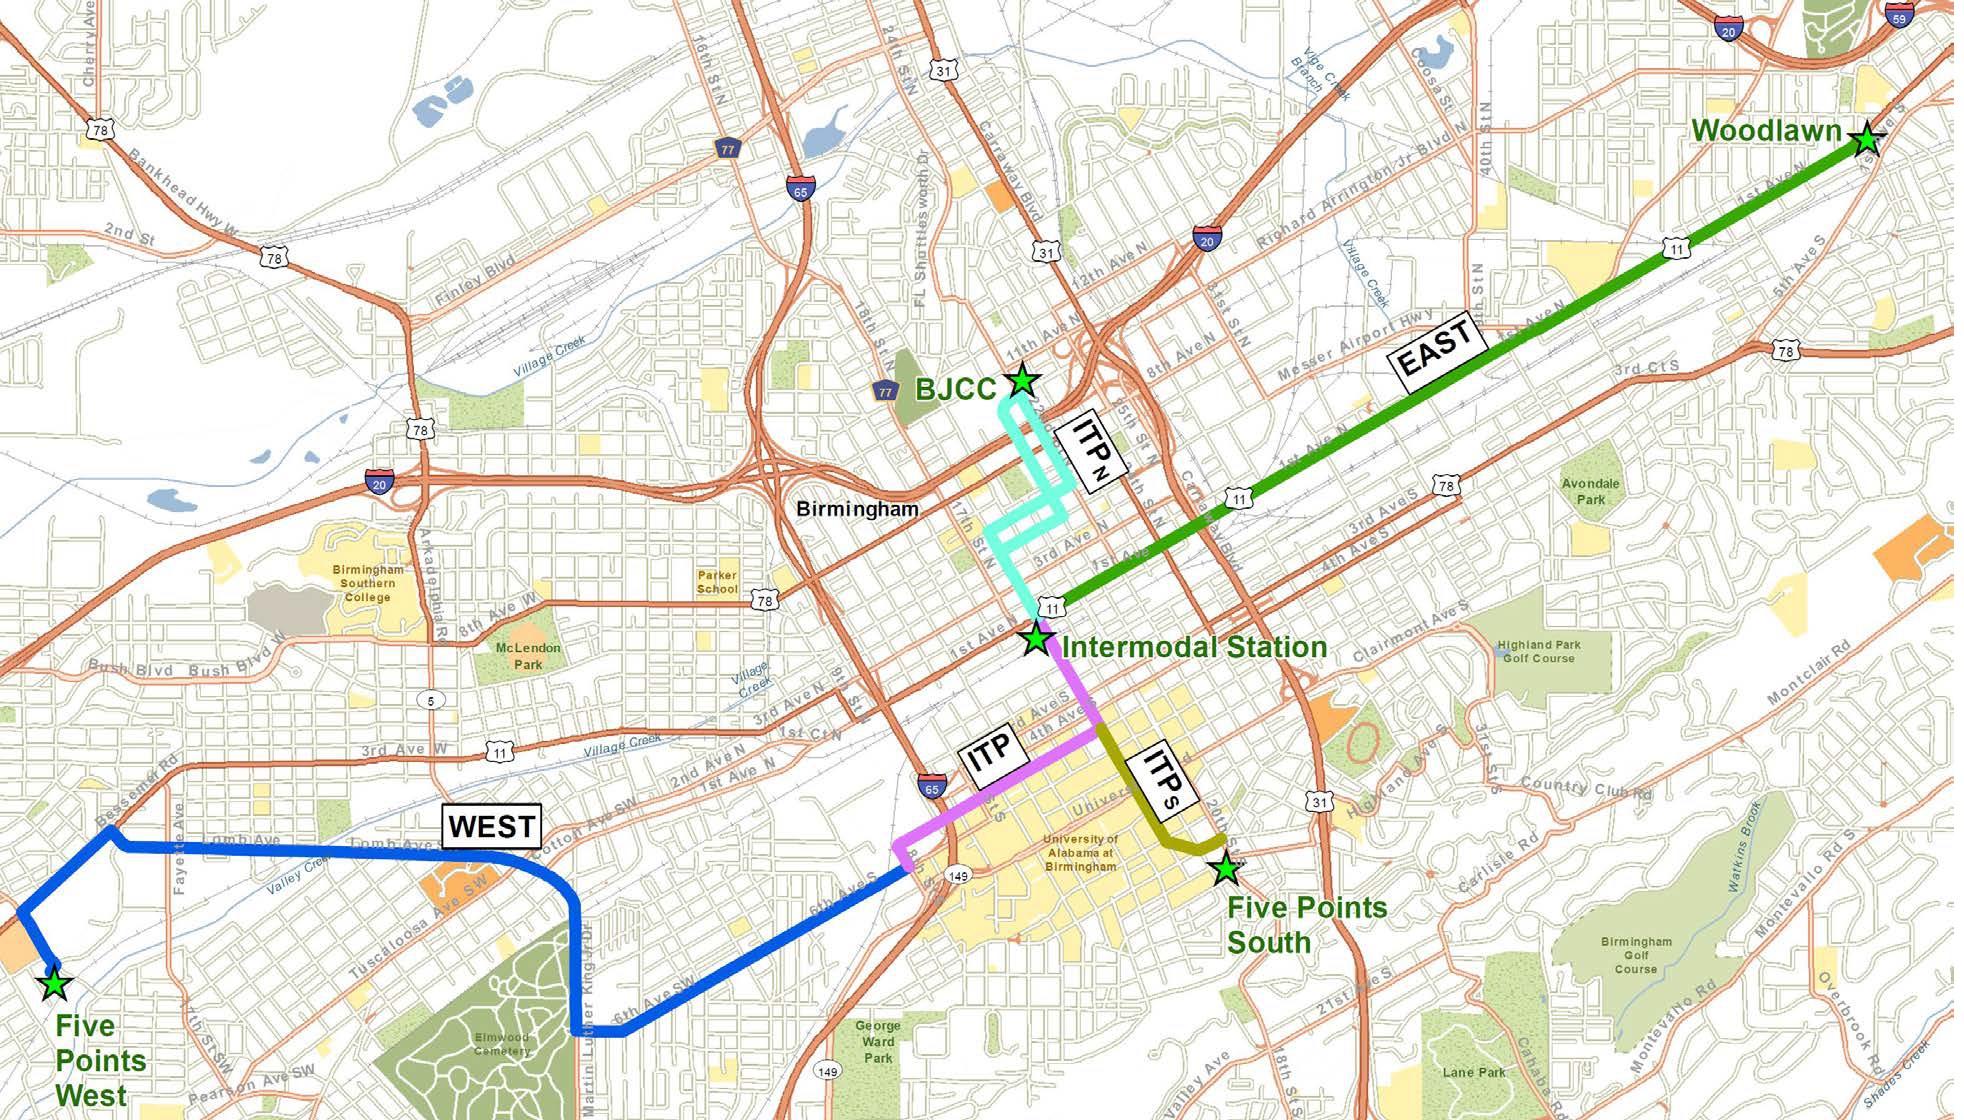 Birmingham Express bus rapid transit corridor. Map courtesy of the city of Birmingham.